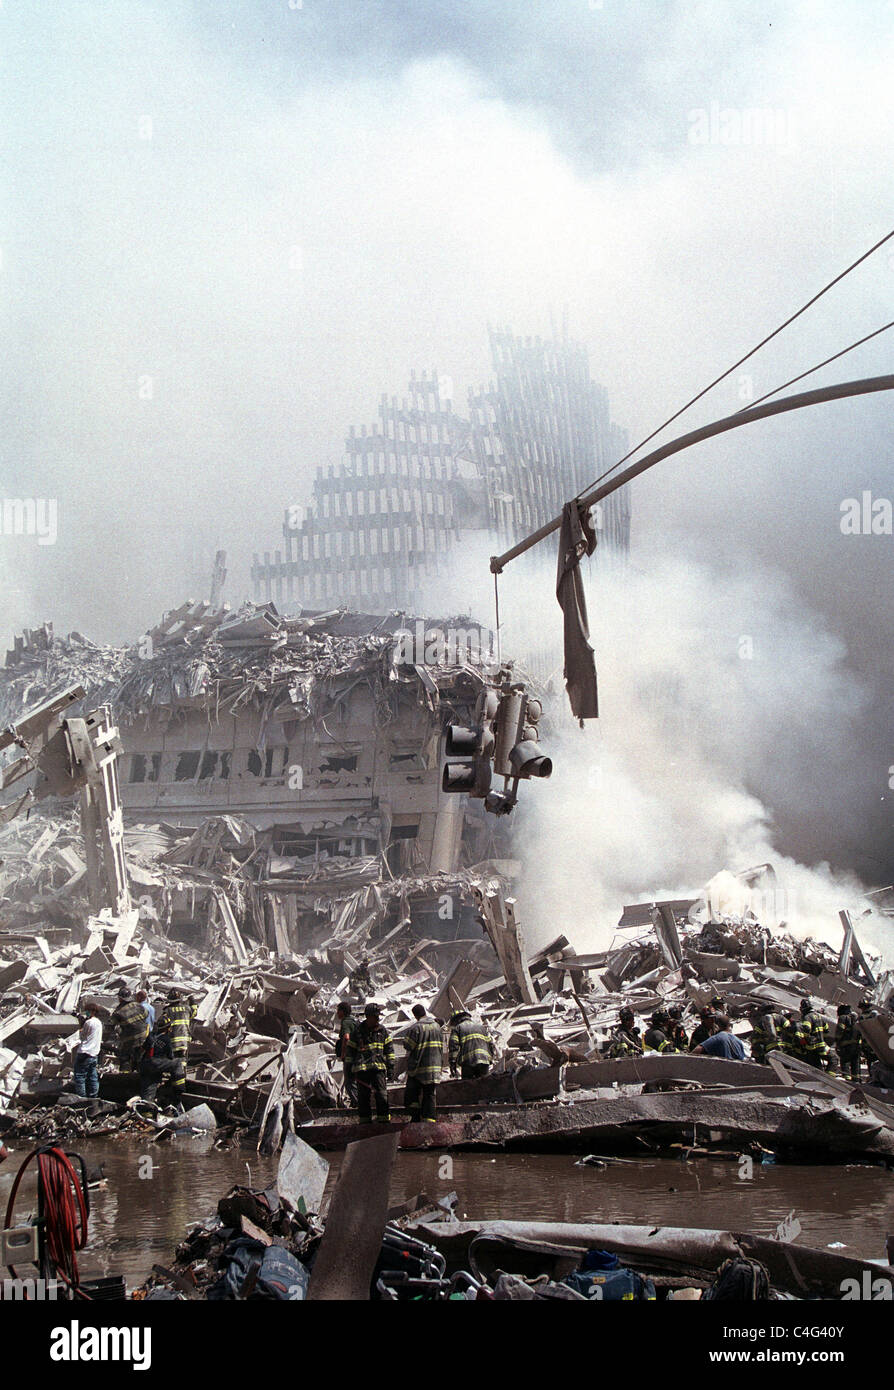 World Trade Center fire/ terrorism September 11, 2001. Emergency personnel outside One WTC. (© Richard B. Levine) - Stock Image